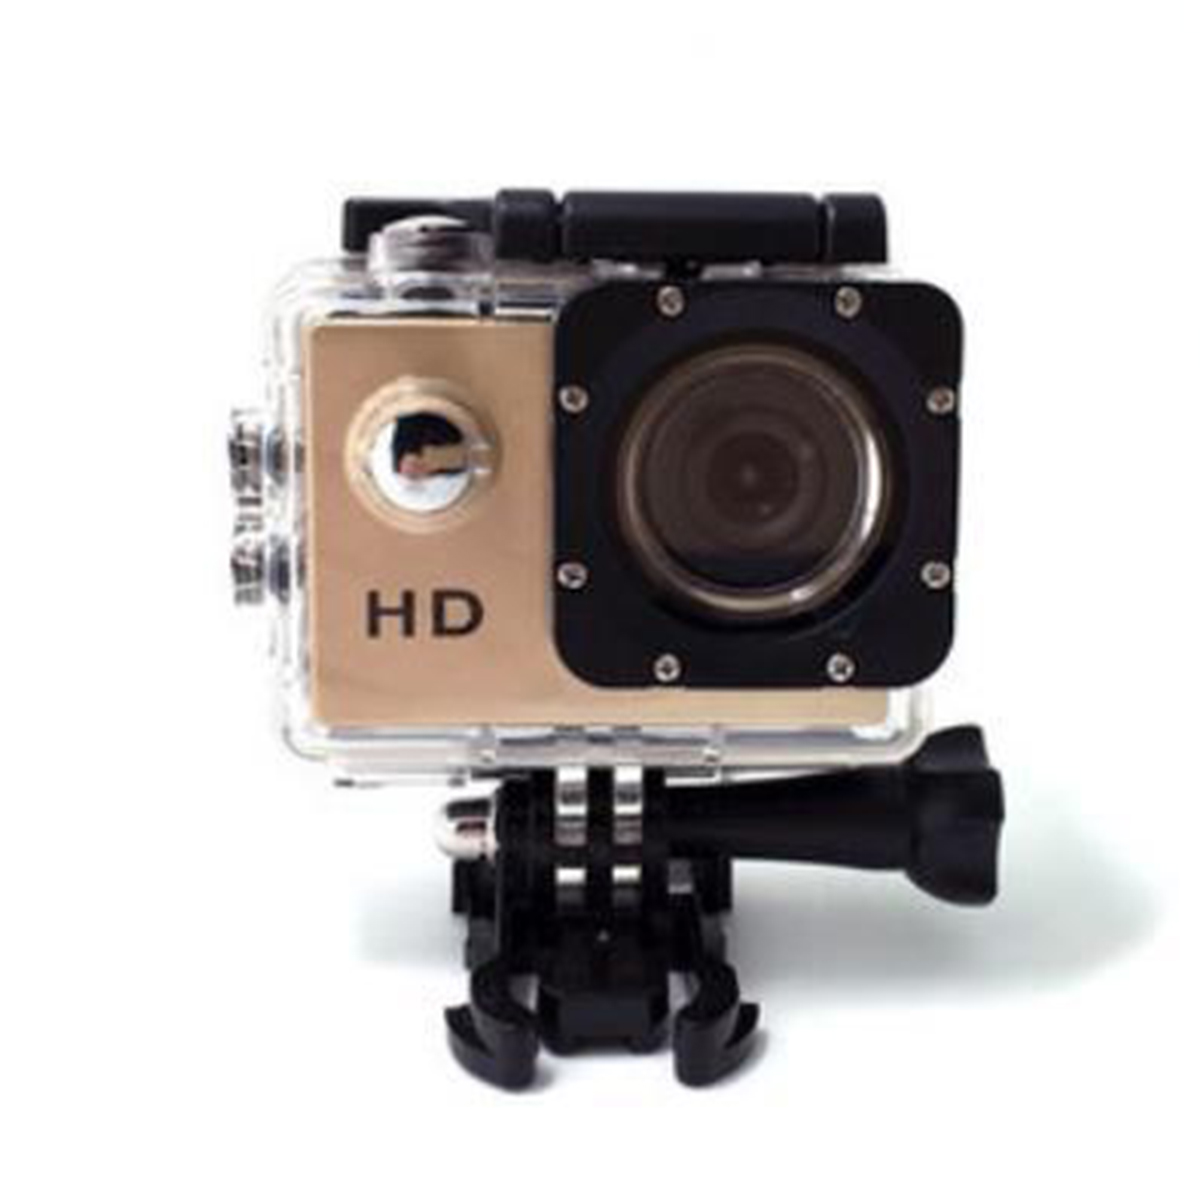 OWGYML Outdoor Sport Action Mini Underwater Camera 480P Full Waterproof Cam DV  Screen Water Resistant Video Surveillance